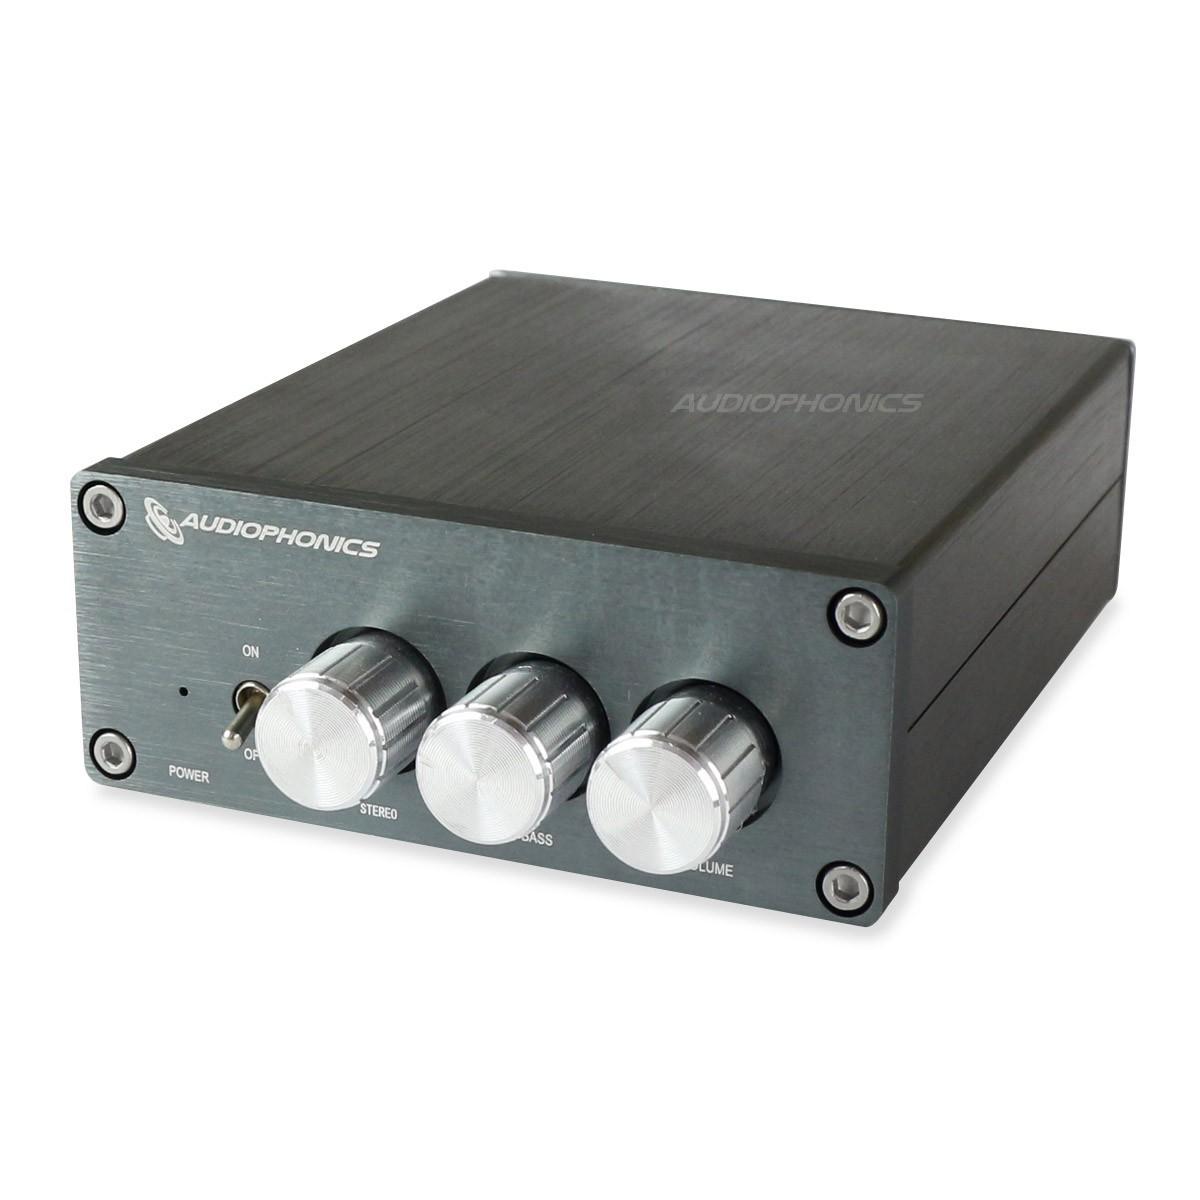 AUDIOPHONICS TPA-SW25 Amplifier 2.1 Class D TPA3116D2 2x 50W + 100W 4 Ohm Silver